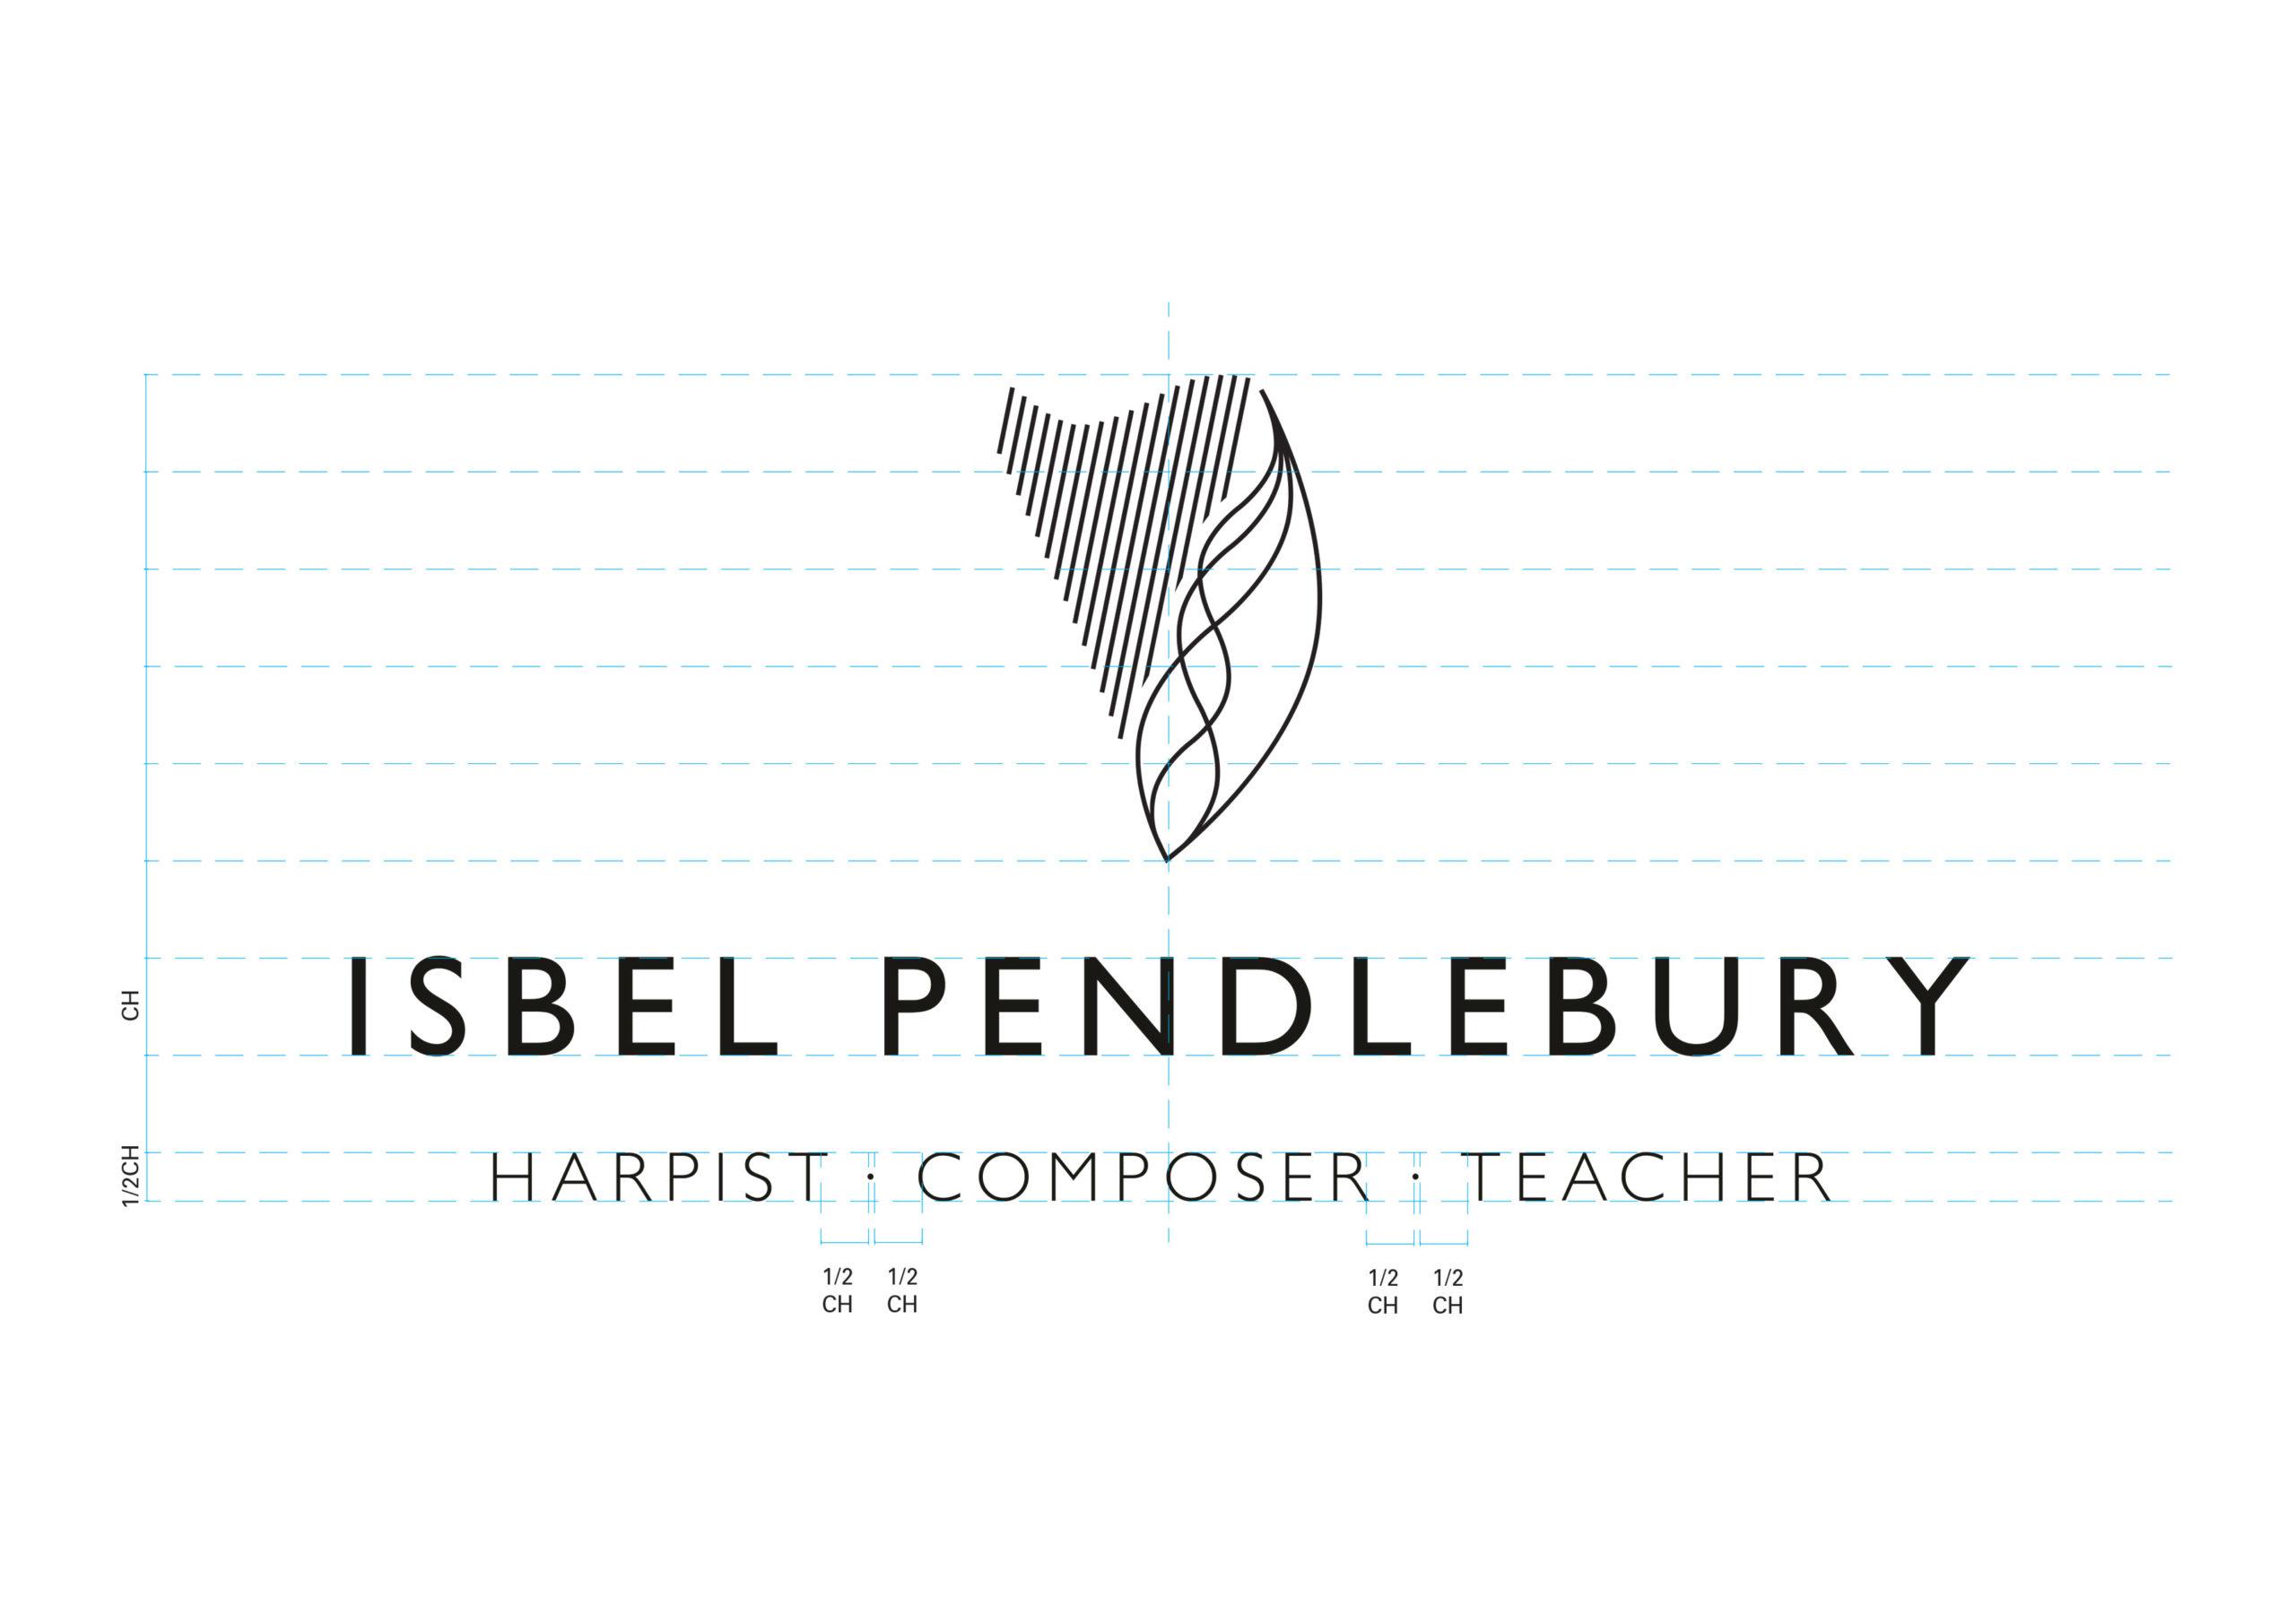 Isbel Pendlebury lock-up